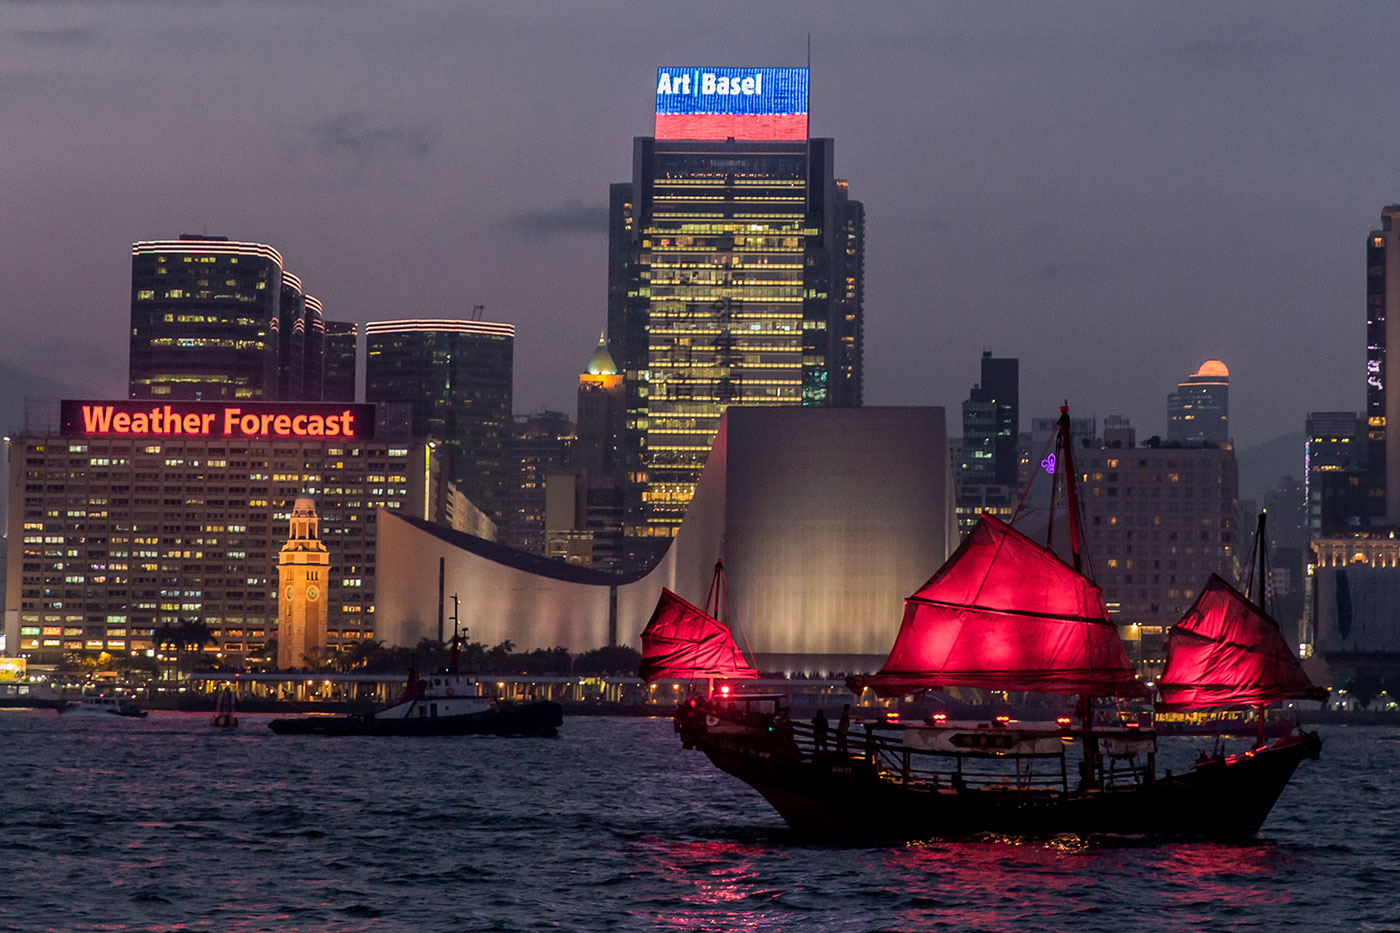 Art-Basel-Hong-Kong-2018-4.jpg